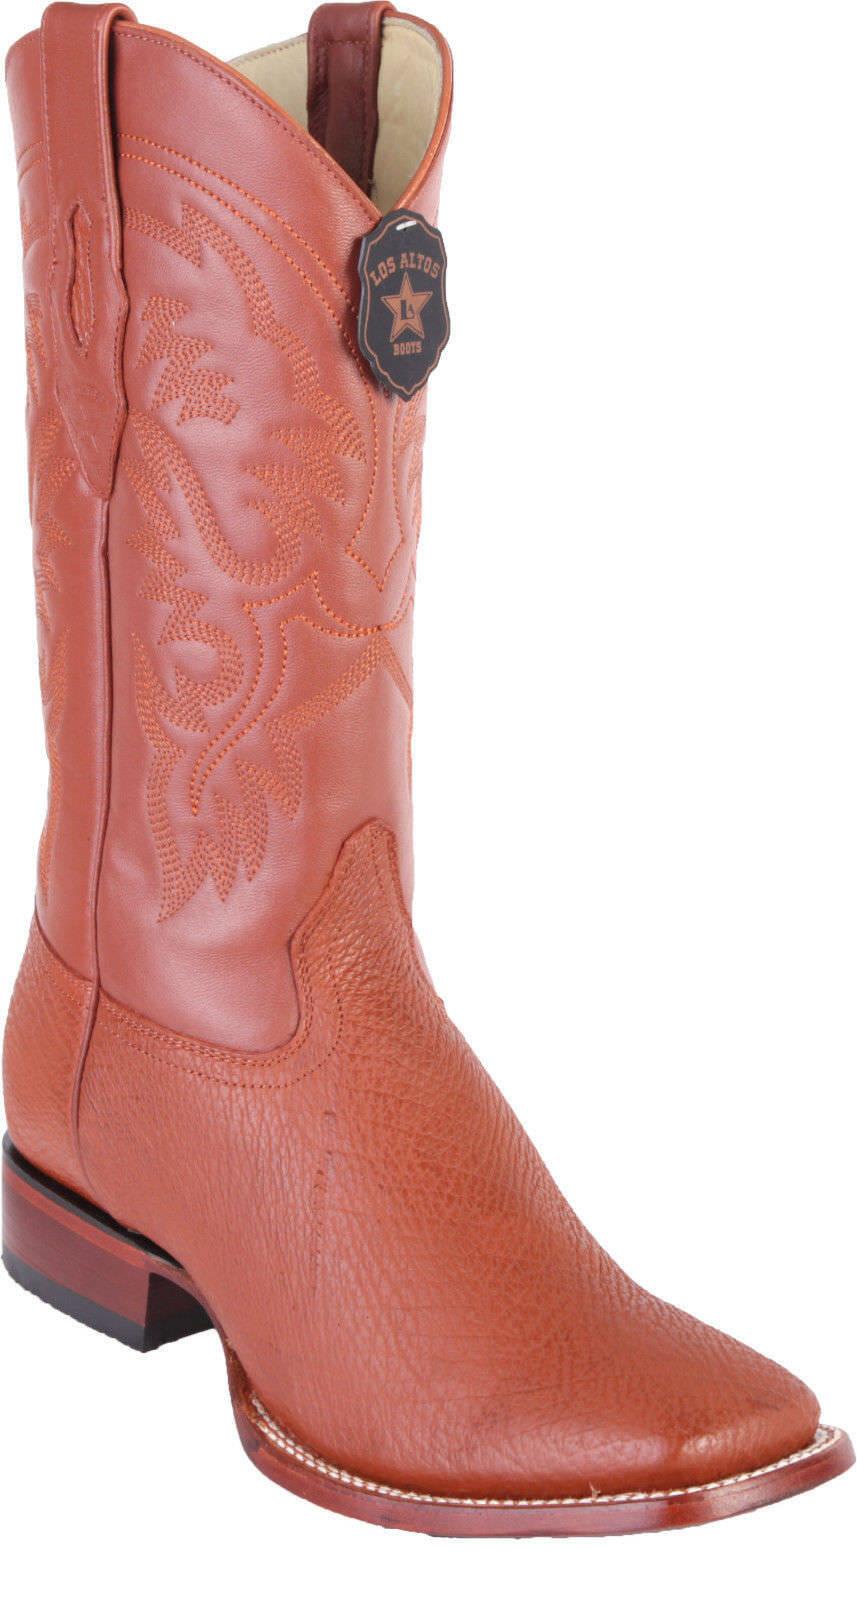 Los Altos COGNAC Genuine SHARK Western Cowboy Boot Square Square Square Toe D c20b9d